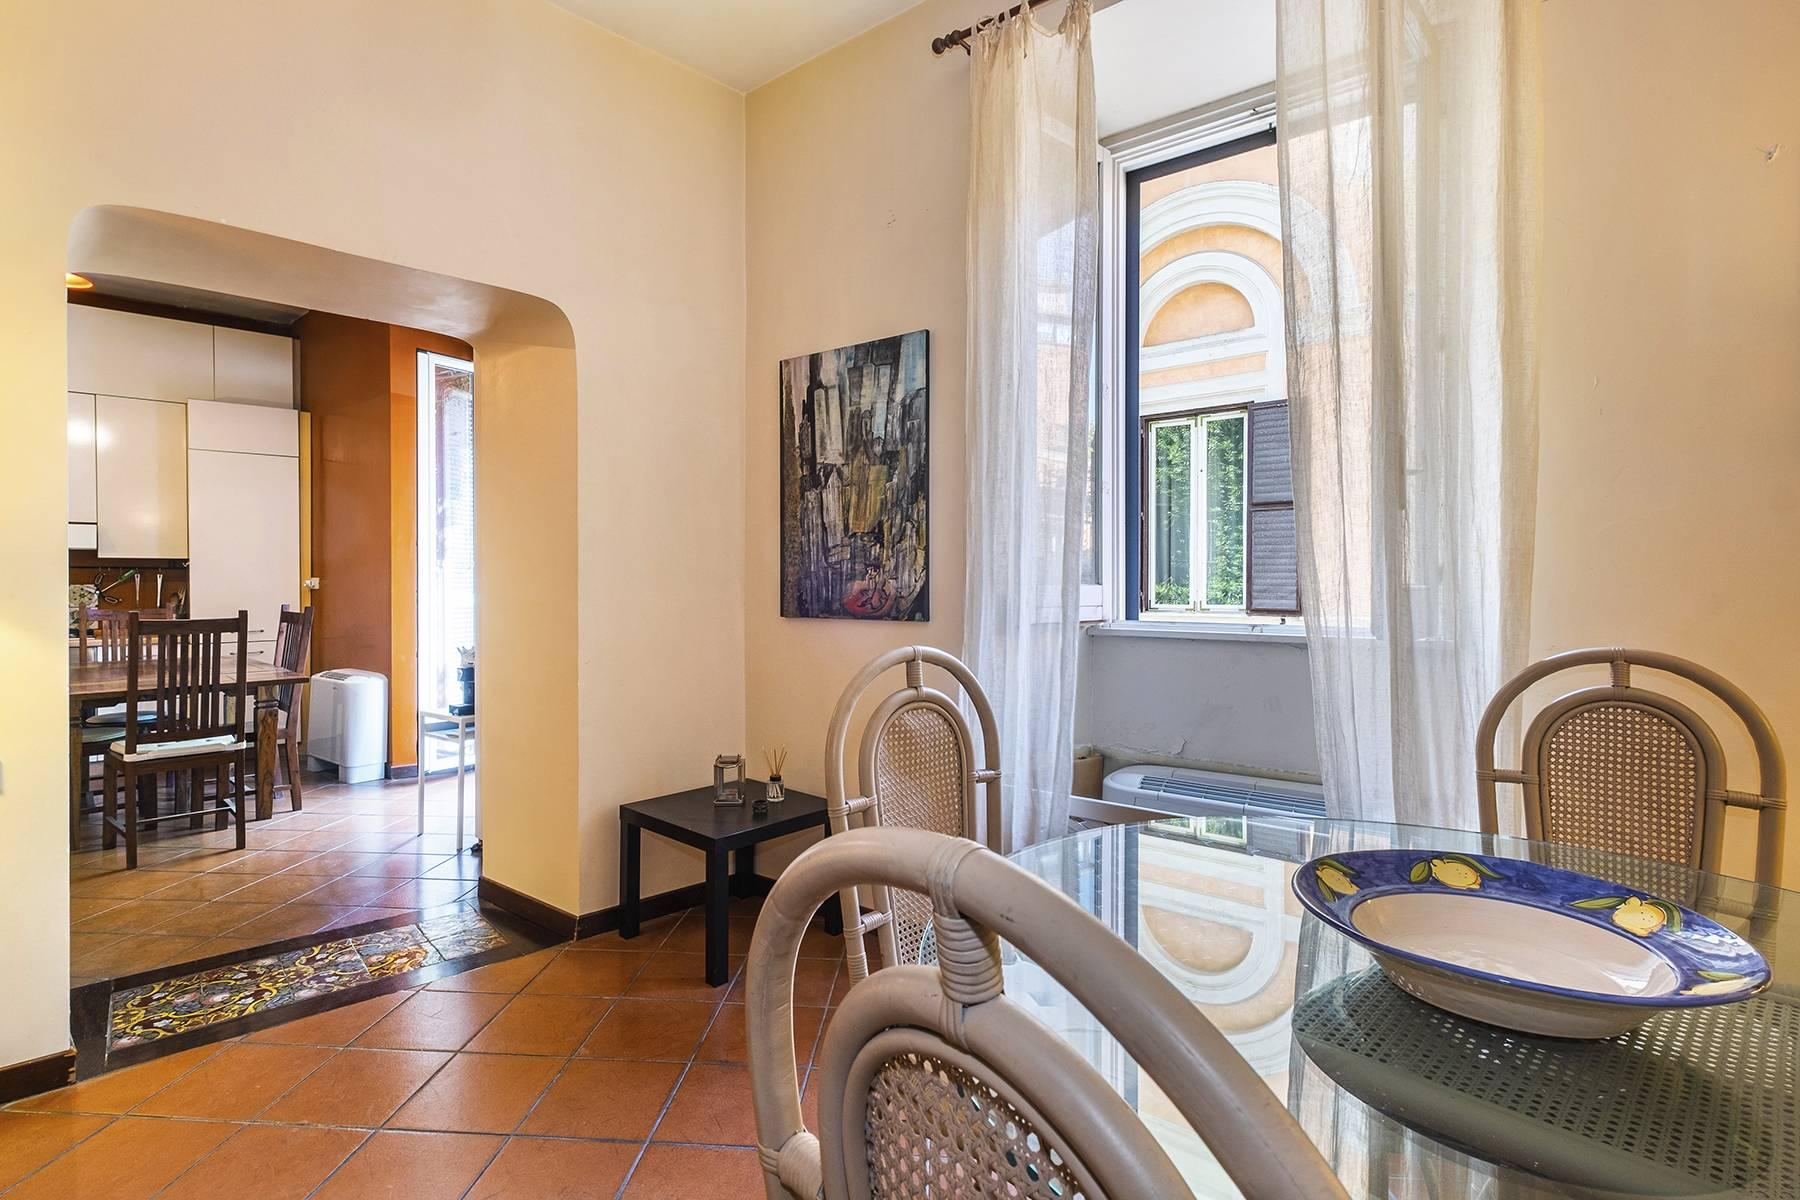 Affascinante appartamento a due passi dal Palatino - 6